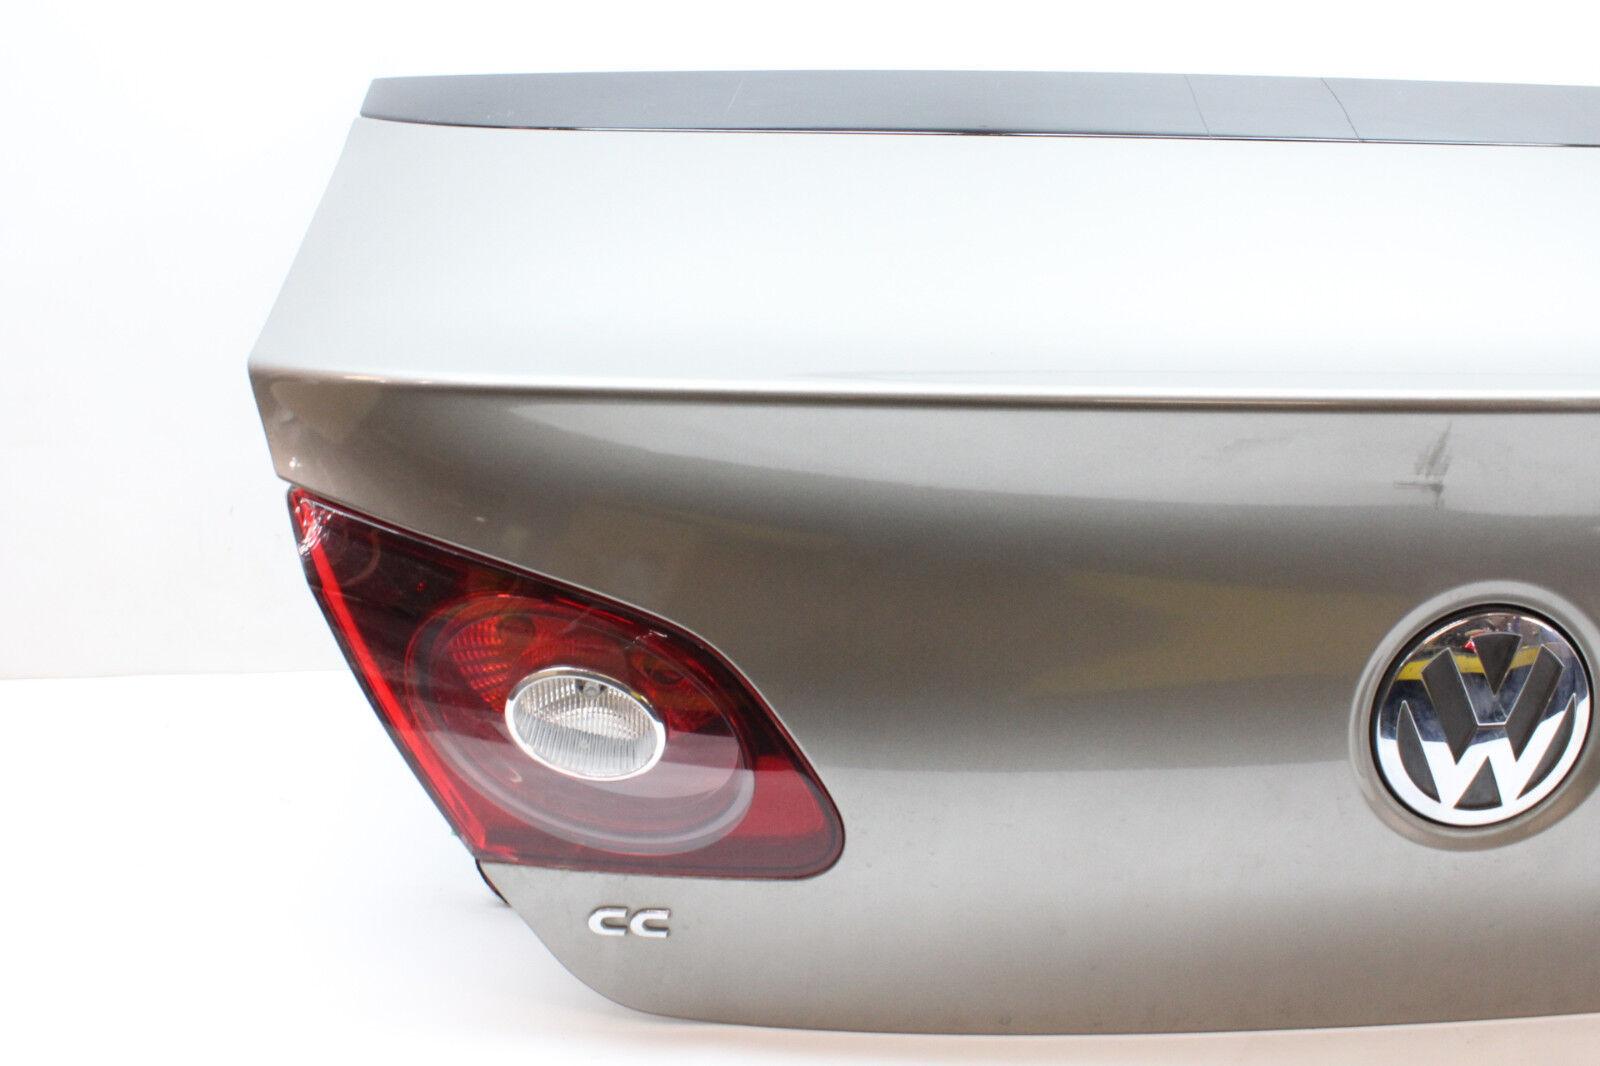 2009 2011 Vw Volkswagen Cc Rear Lift Gate Wiring Harness Oem Genuine Teca Tape 3c8971182e Ebay